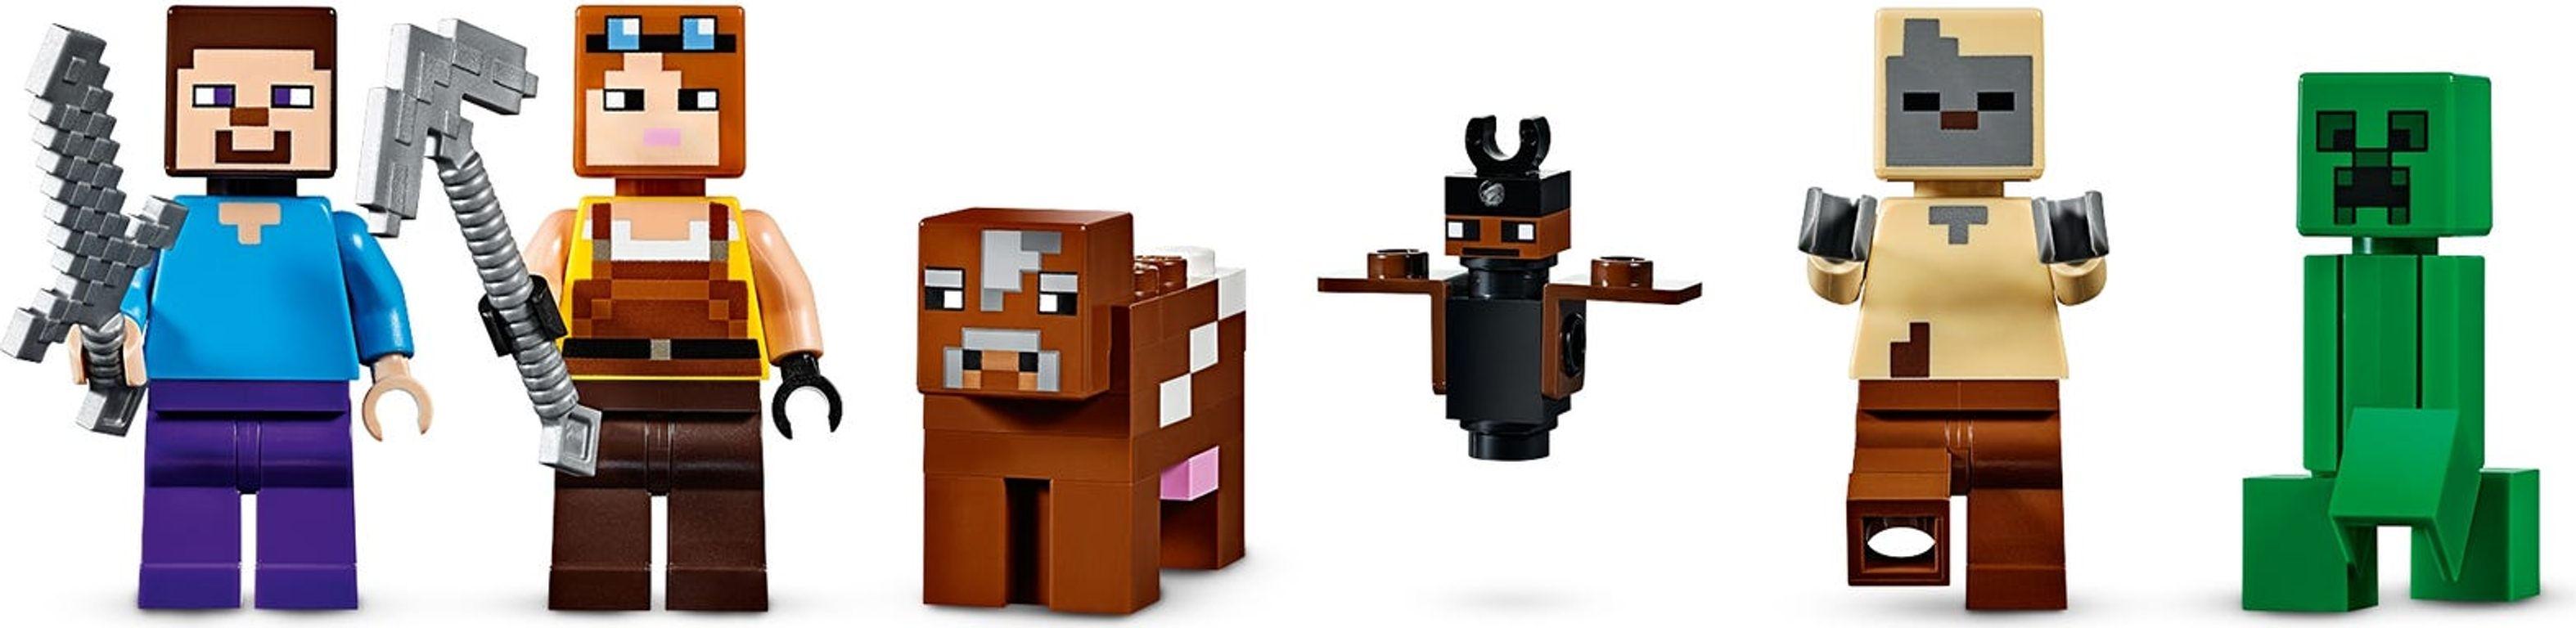 The Creeper™ Mine minifigures